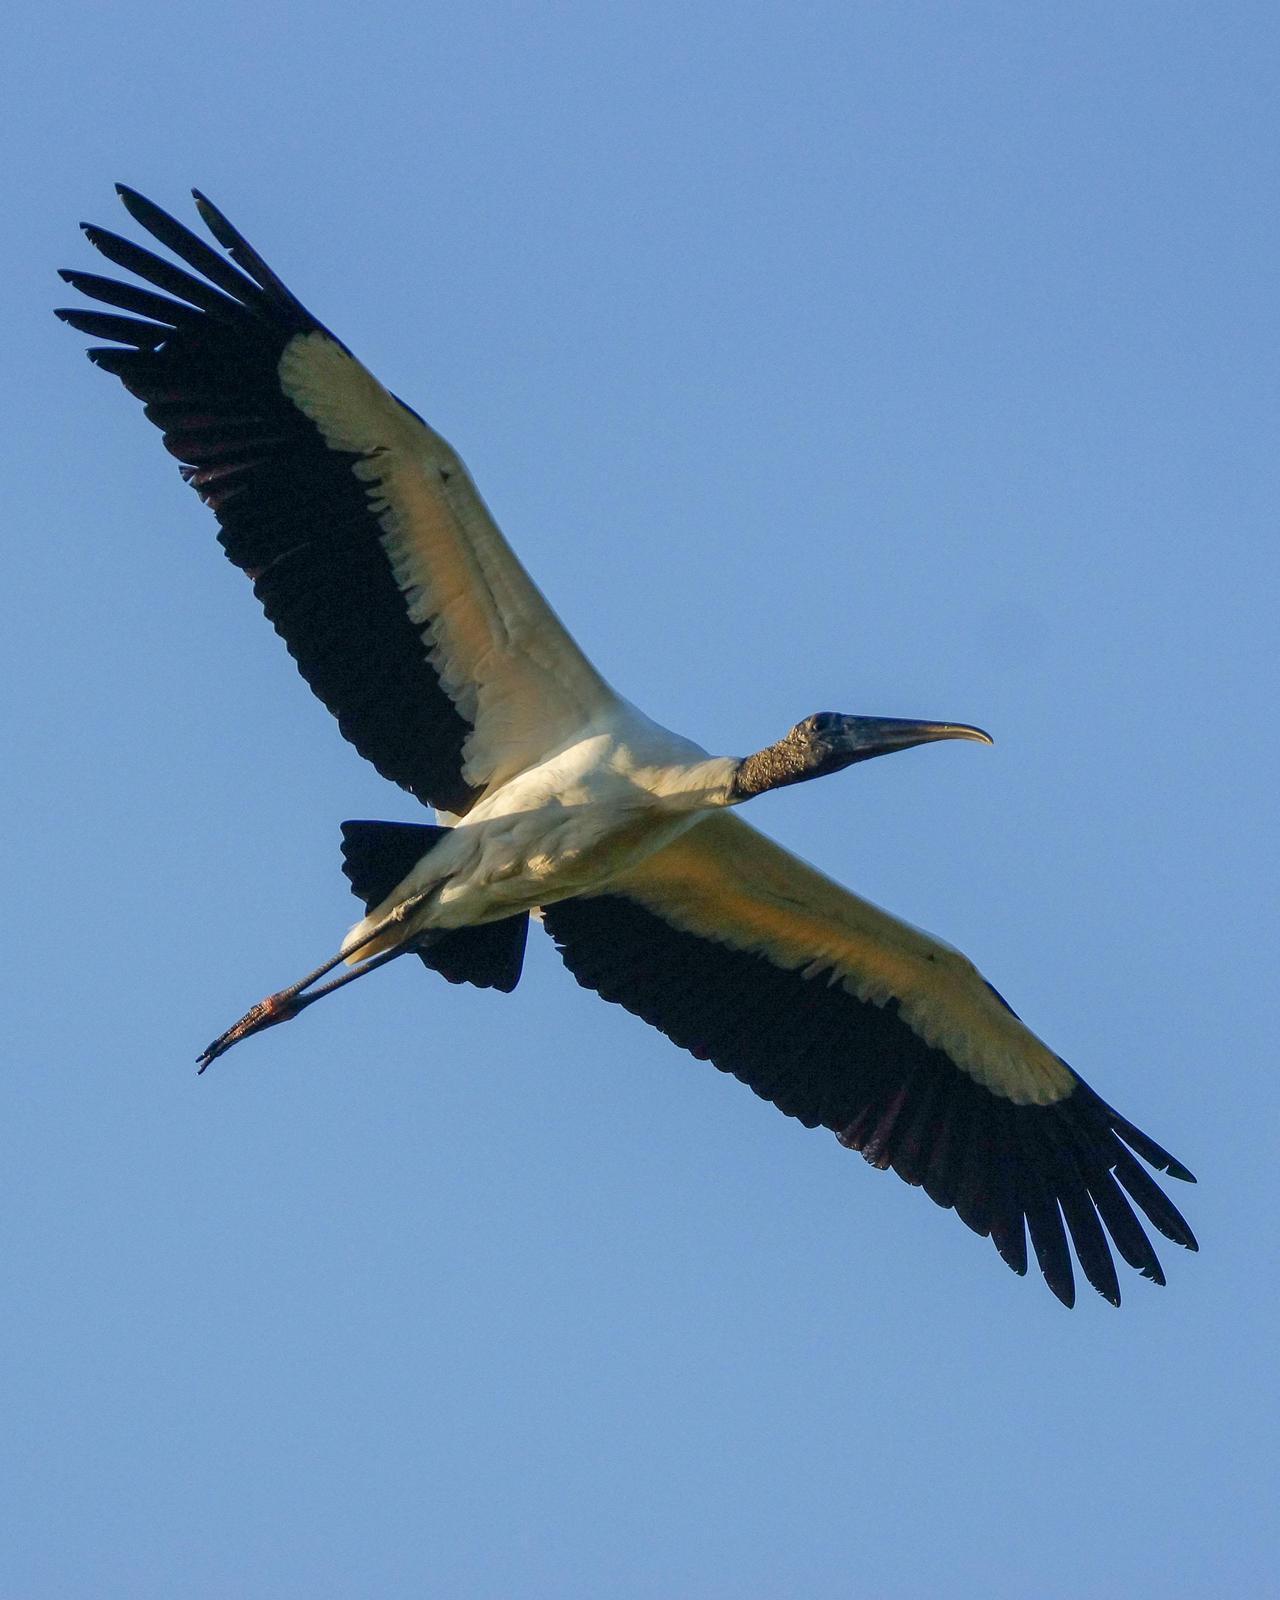 Wood Stork Photo by Steve Percival